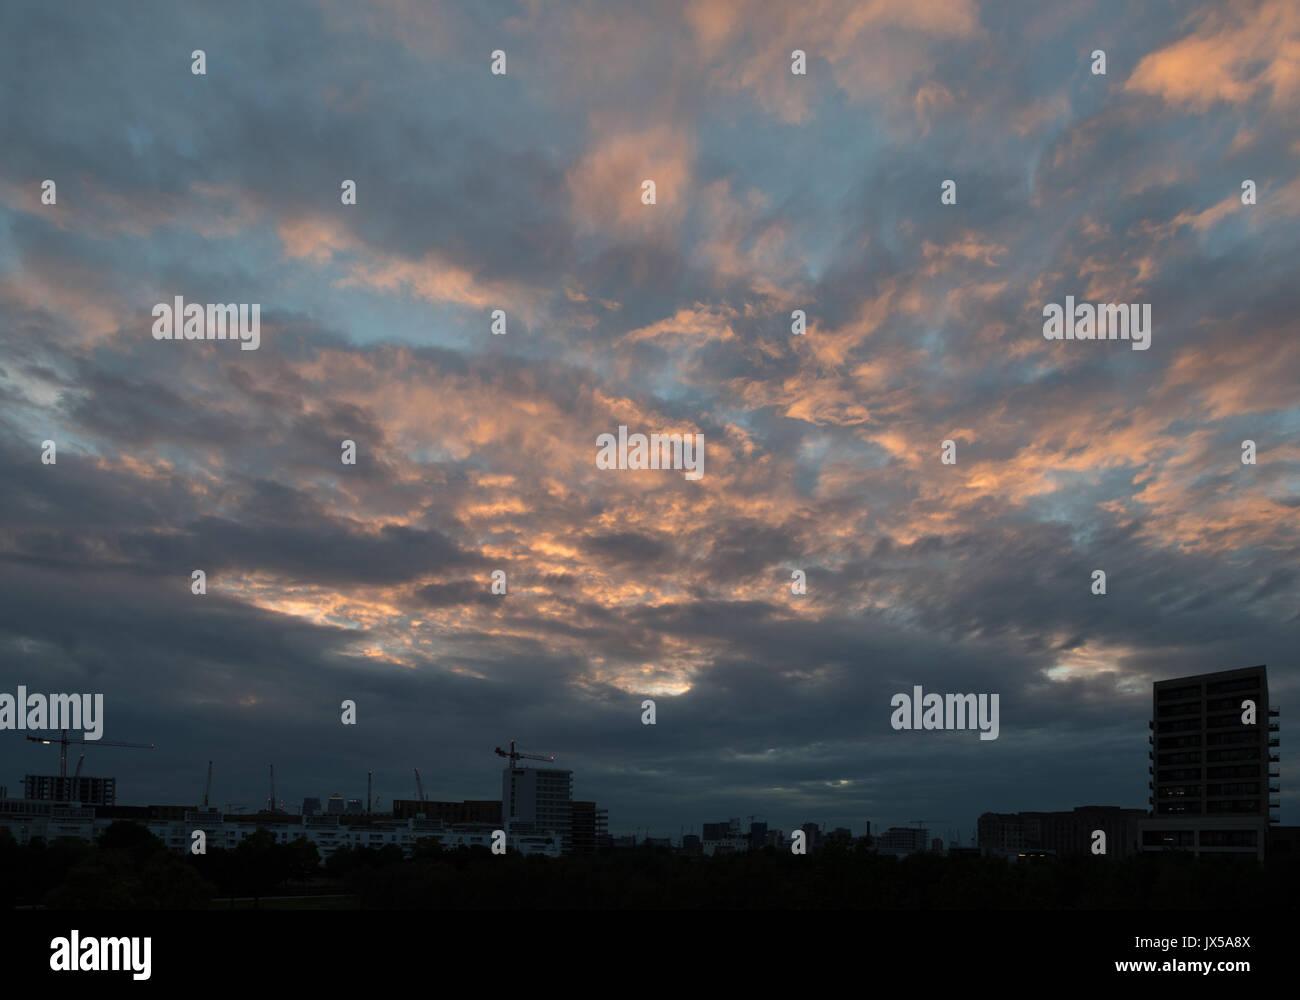 Silvertown, London, UK. 14th August 2017. UK Weather:  Cloudy orange sunset at London city airport. Credit: WansfordPhoto/Alamy Stock Photo